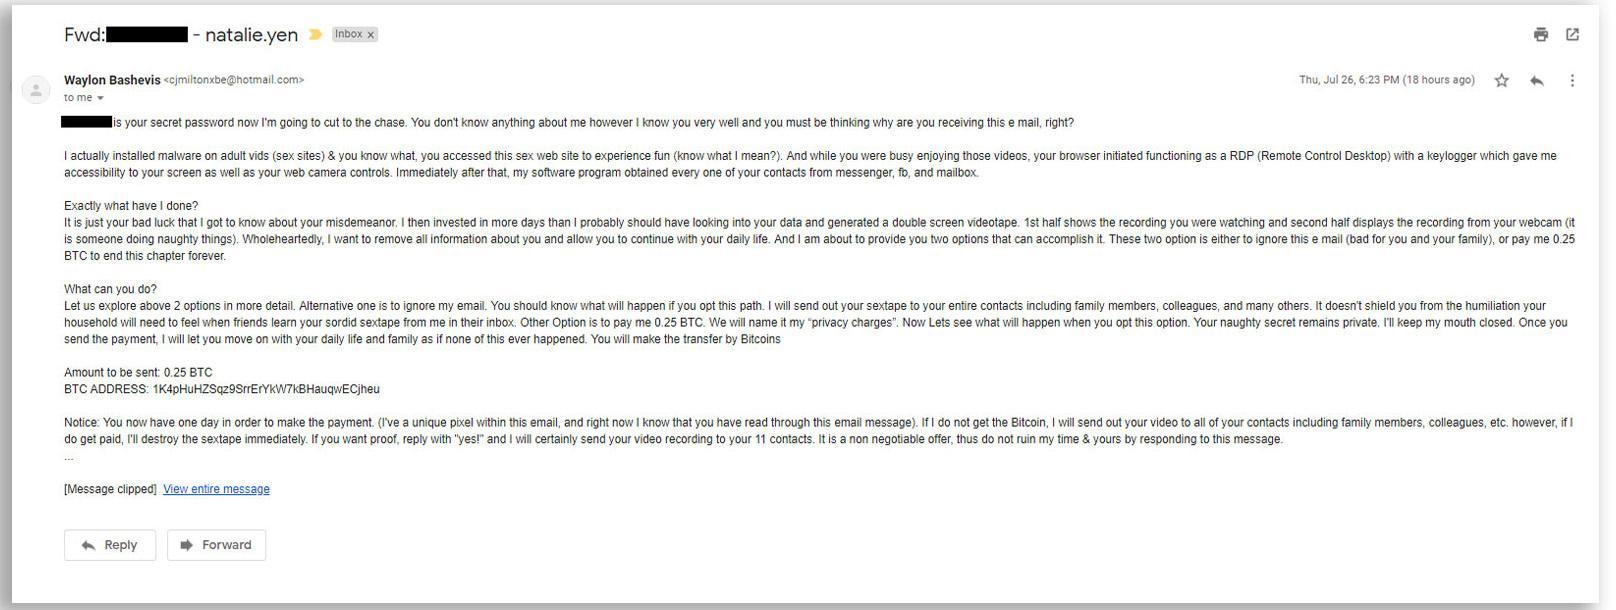 E-posten Ngo fikk.